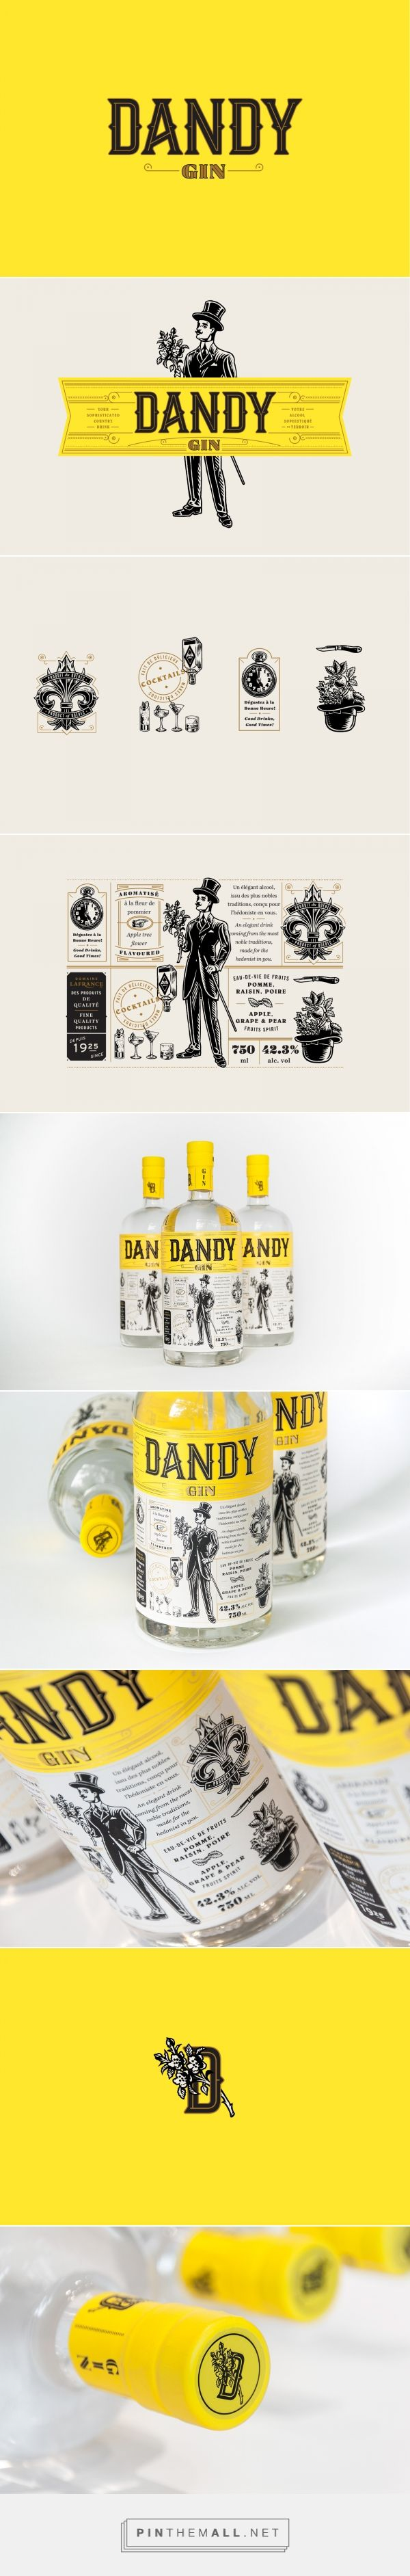 Dandy Gin packaging design by Polygraphe - http://www.packagingoftheworld.com/2017/11/dandy-gin.html